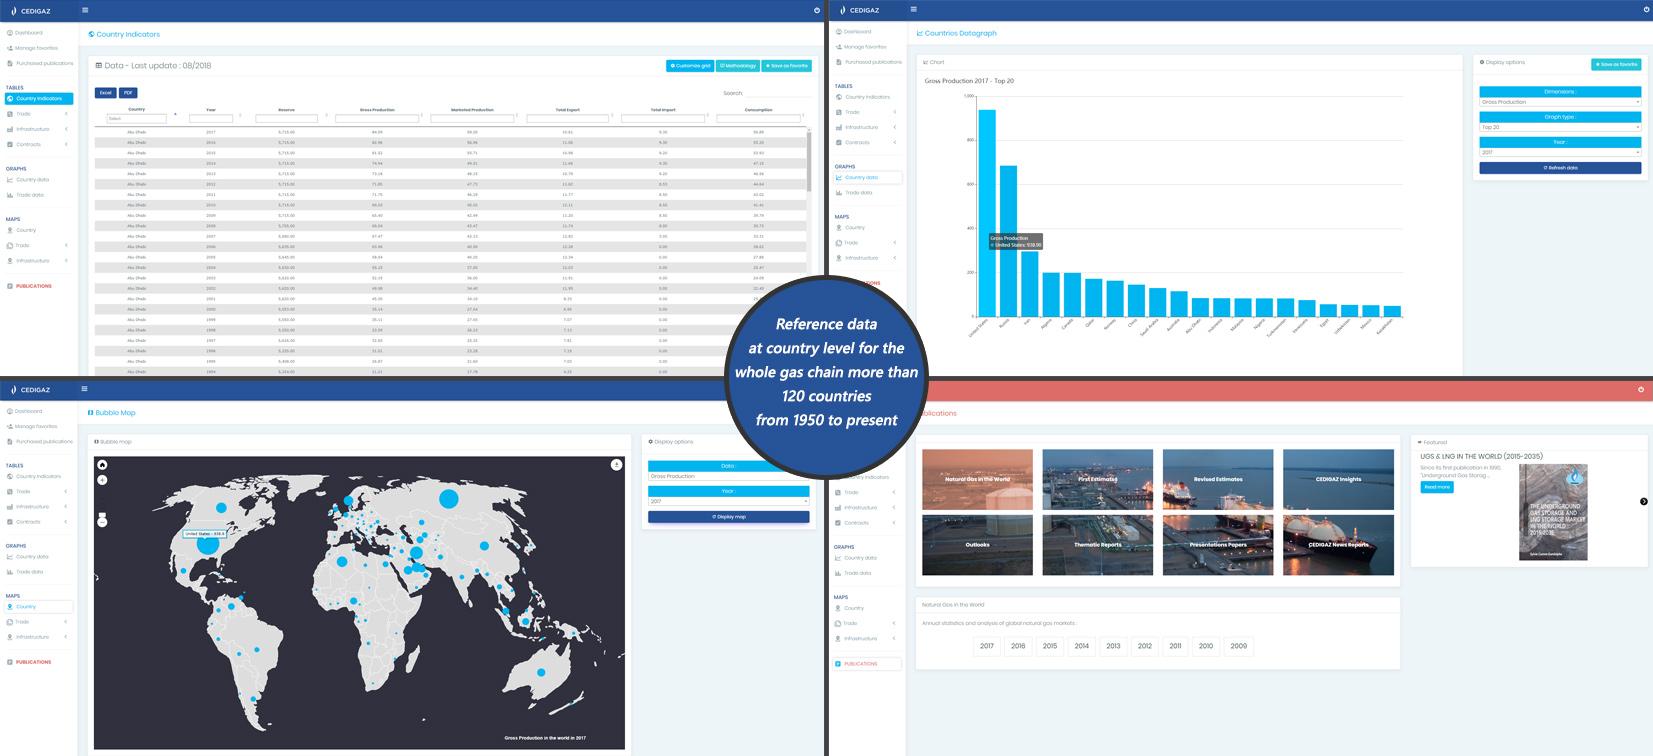 Cedigaz databases - Cedigaz